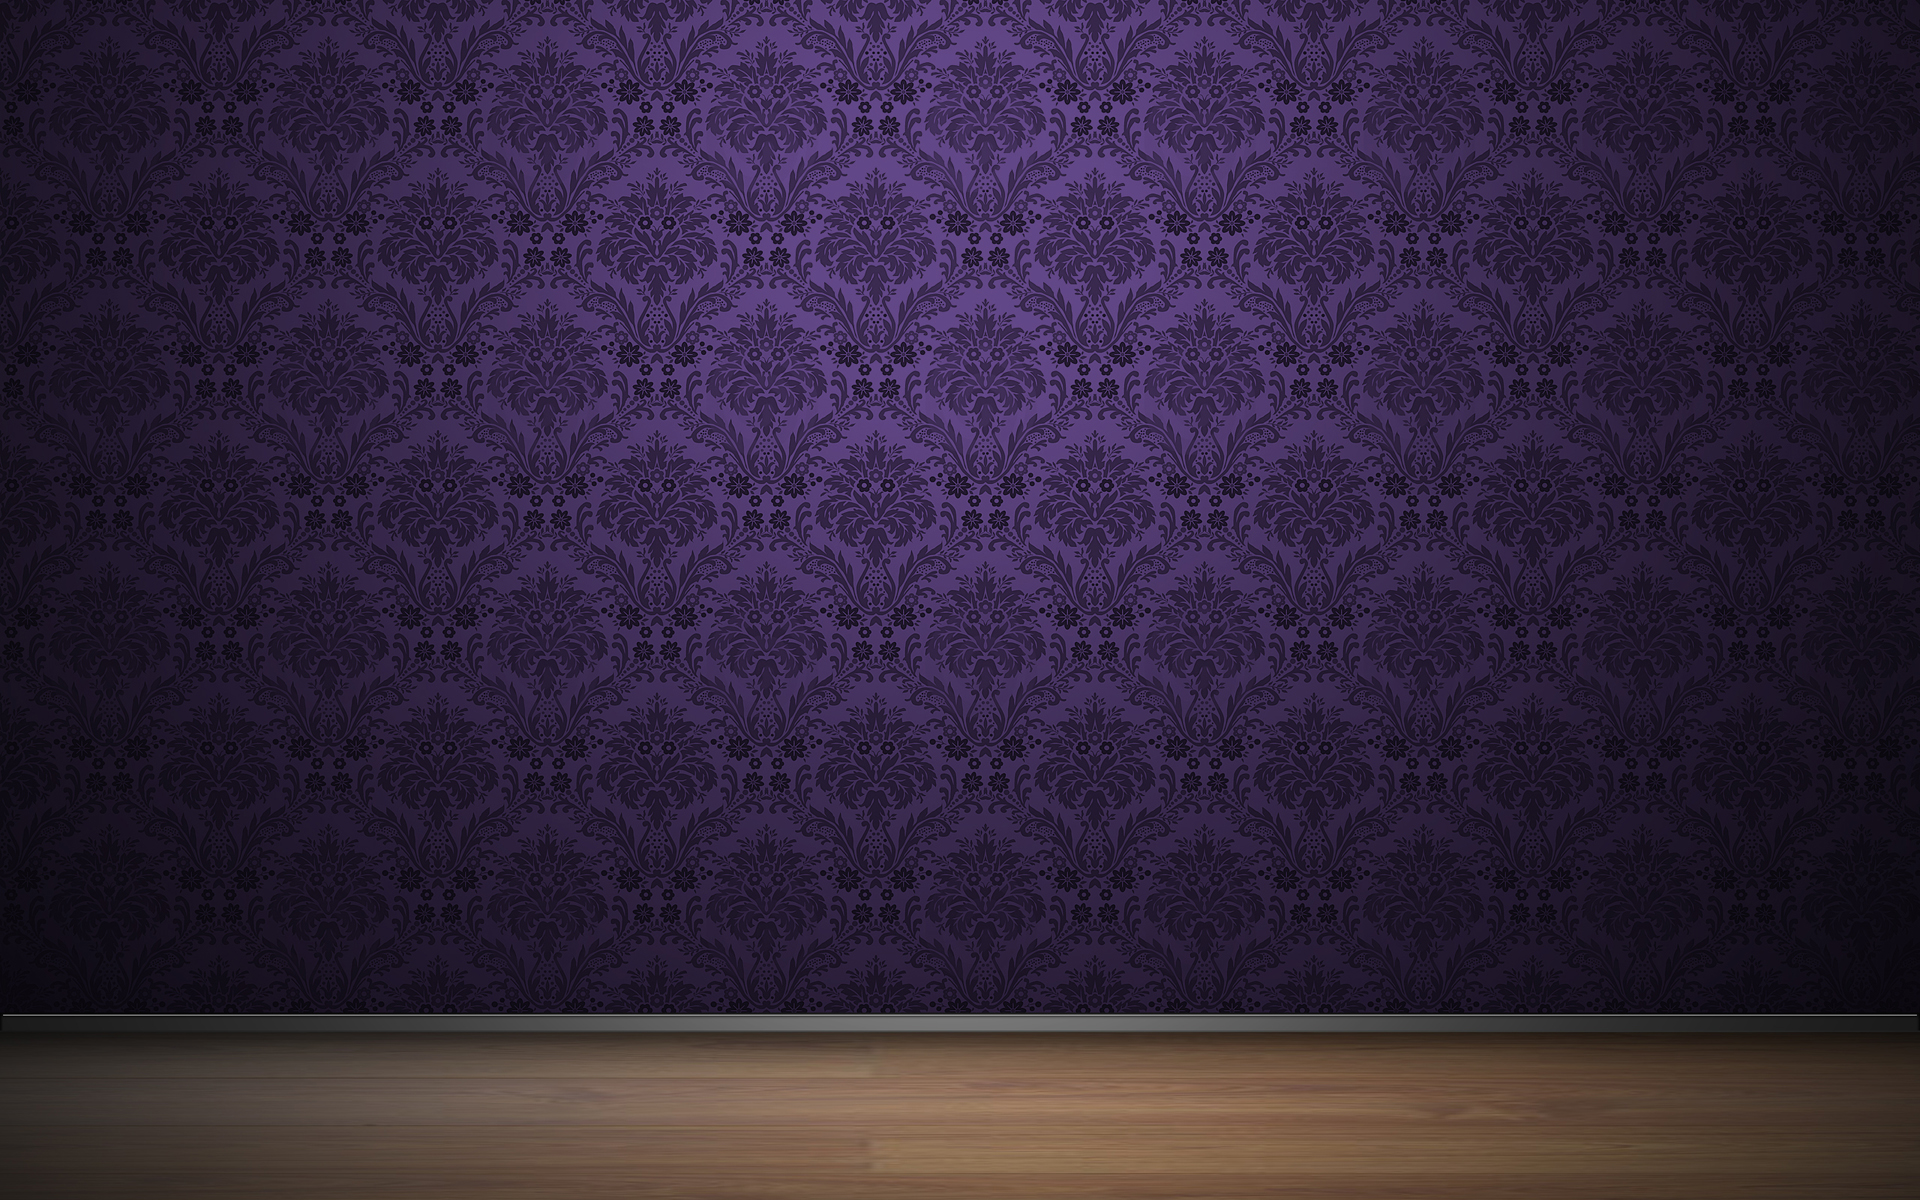 xo wallpaper hd